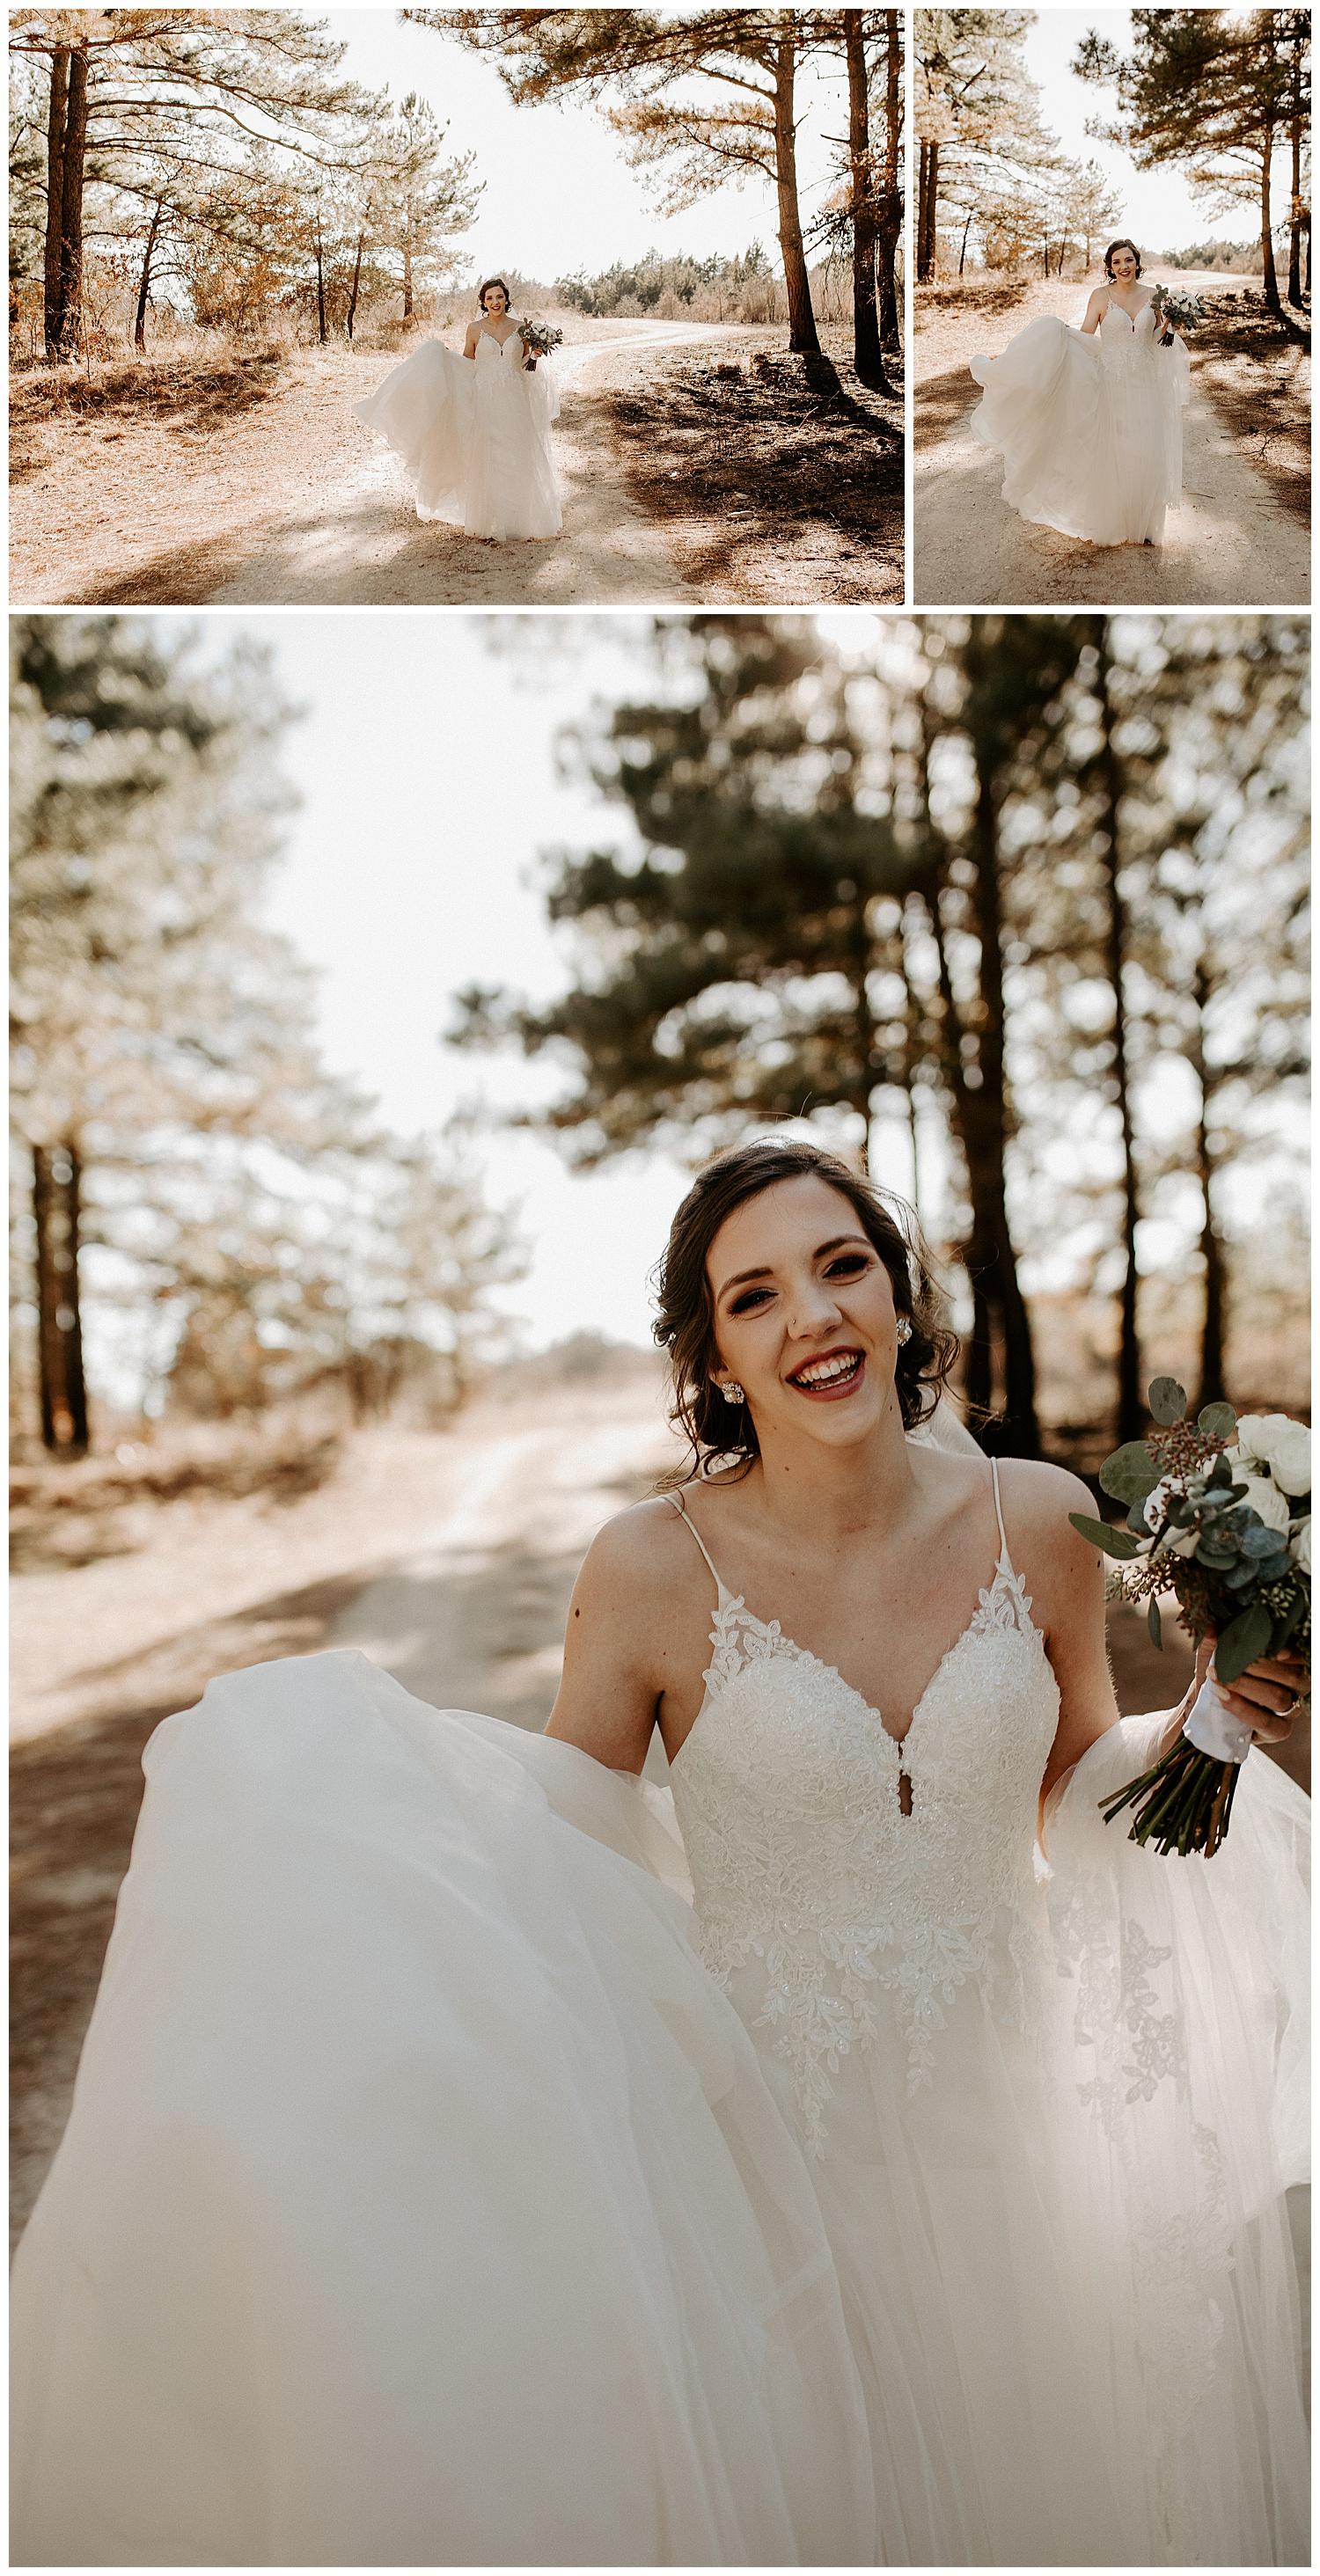 Laken-Mackenzie-Photography-Cheyenne-Bridal-Session-Dallas-Fort-Worth-Wedding-Photographer19.jpg